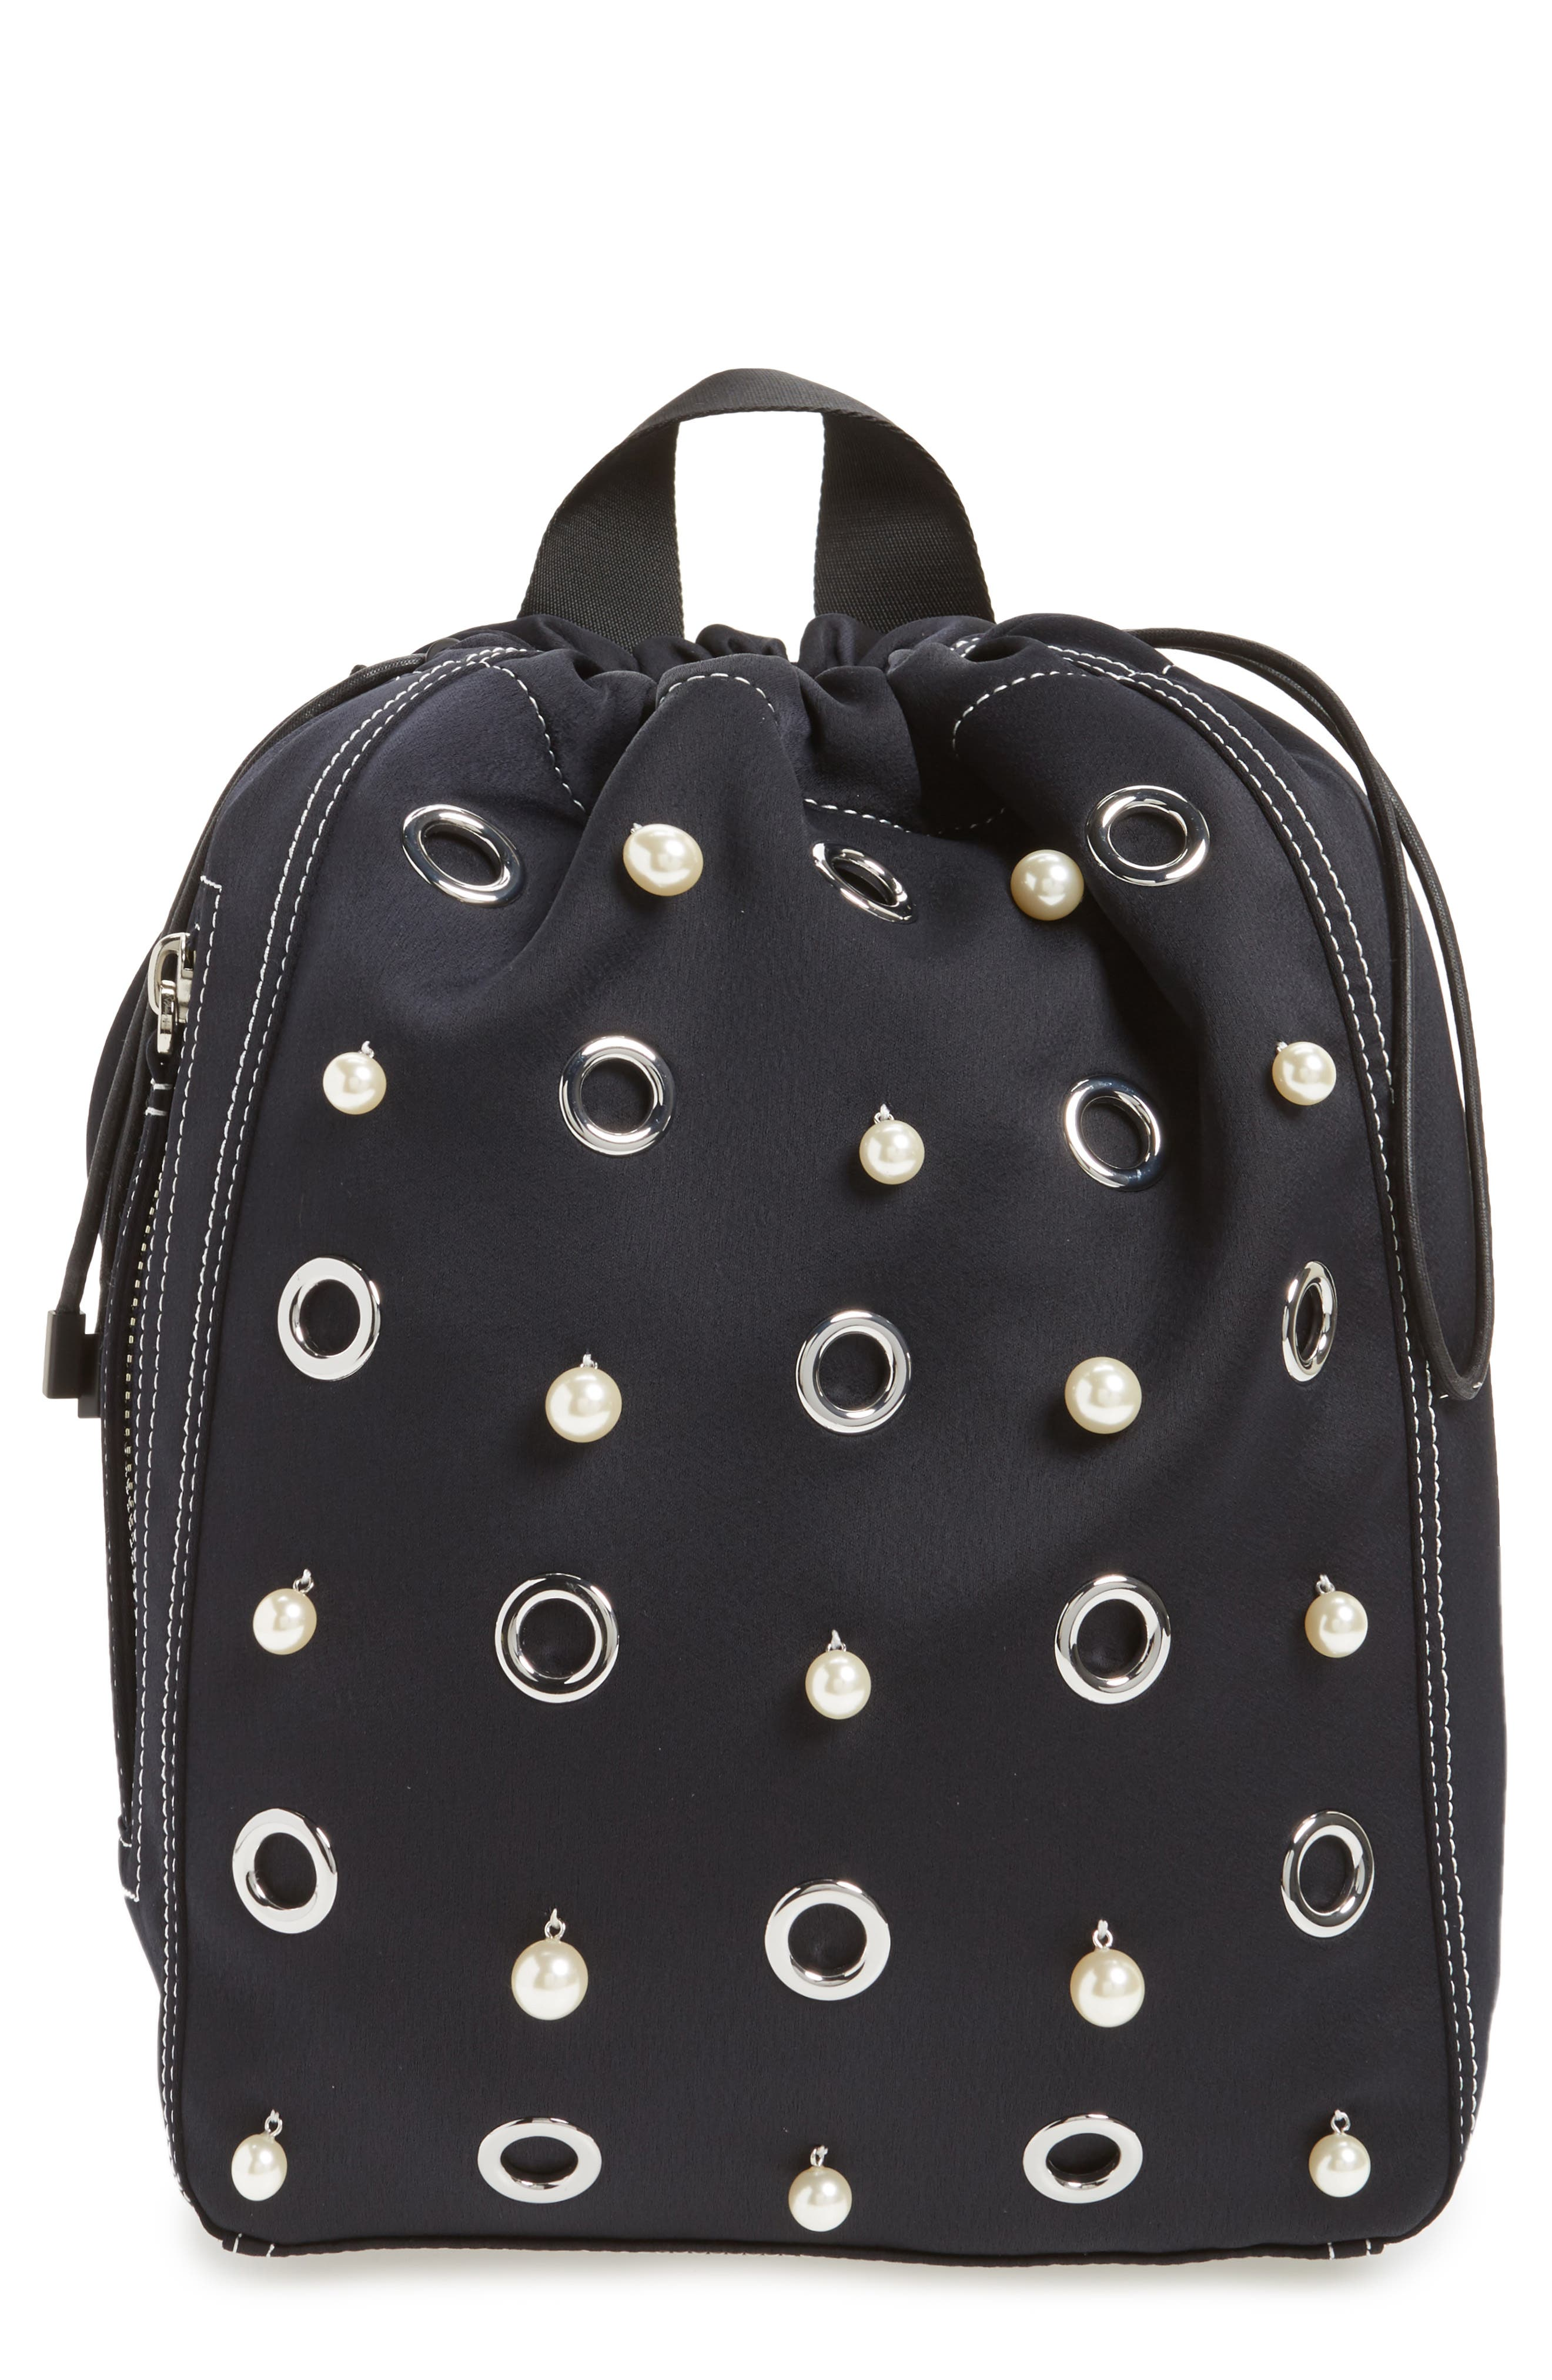 Phillip Lim 3.1 Medium Go-Go Embellished Backpack,                             Main thumbnail 2, color,